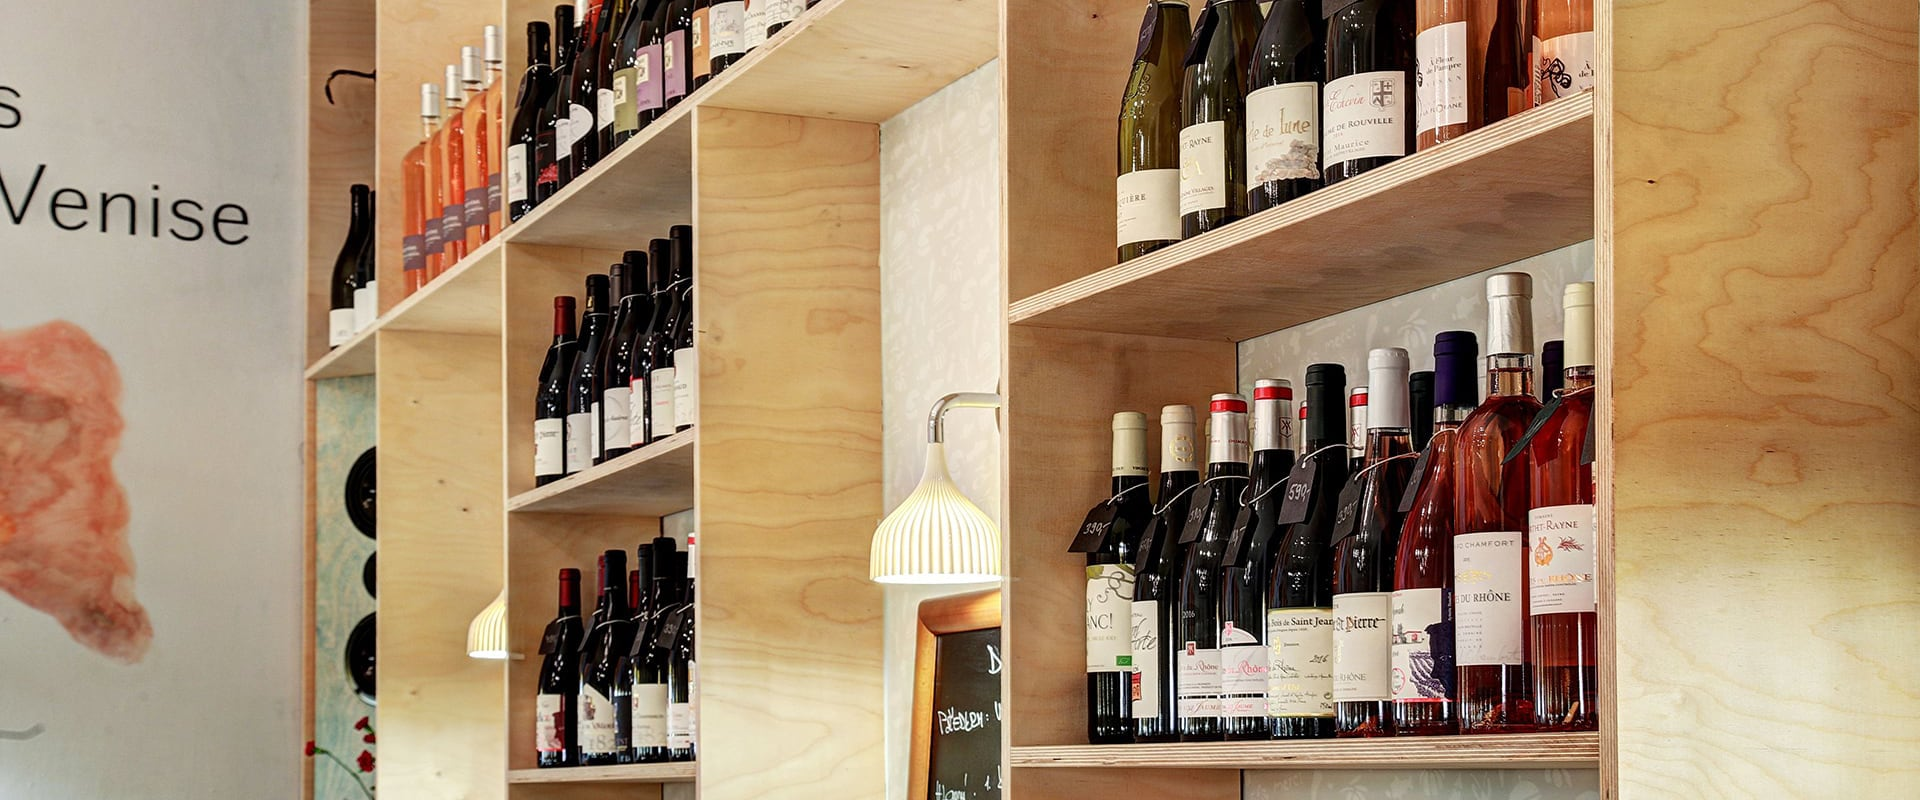 vína a vinotéka Na břehu Rhôny